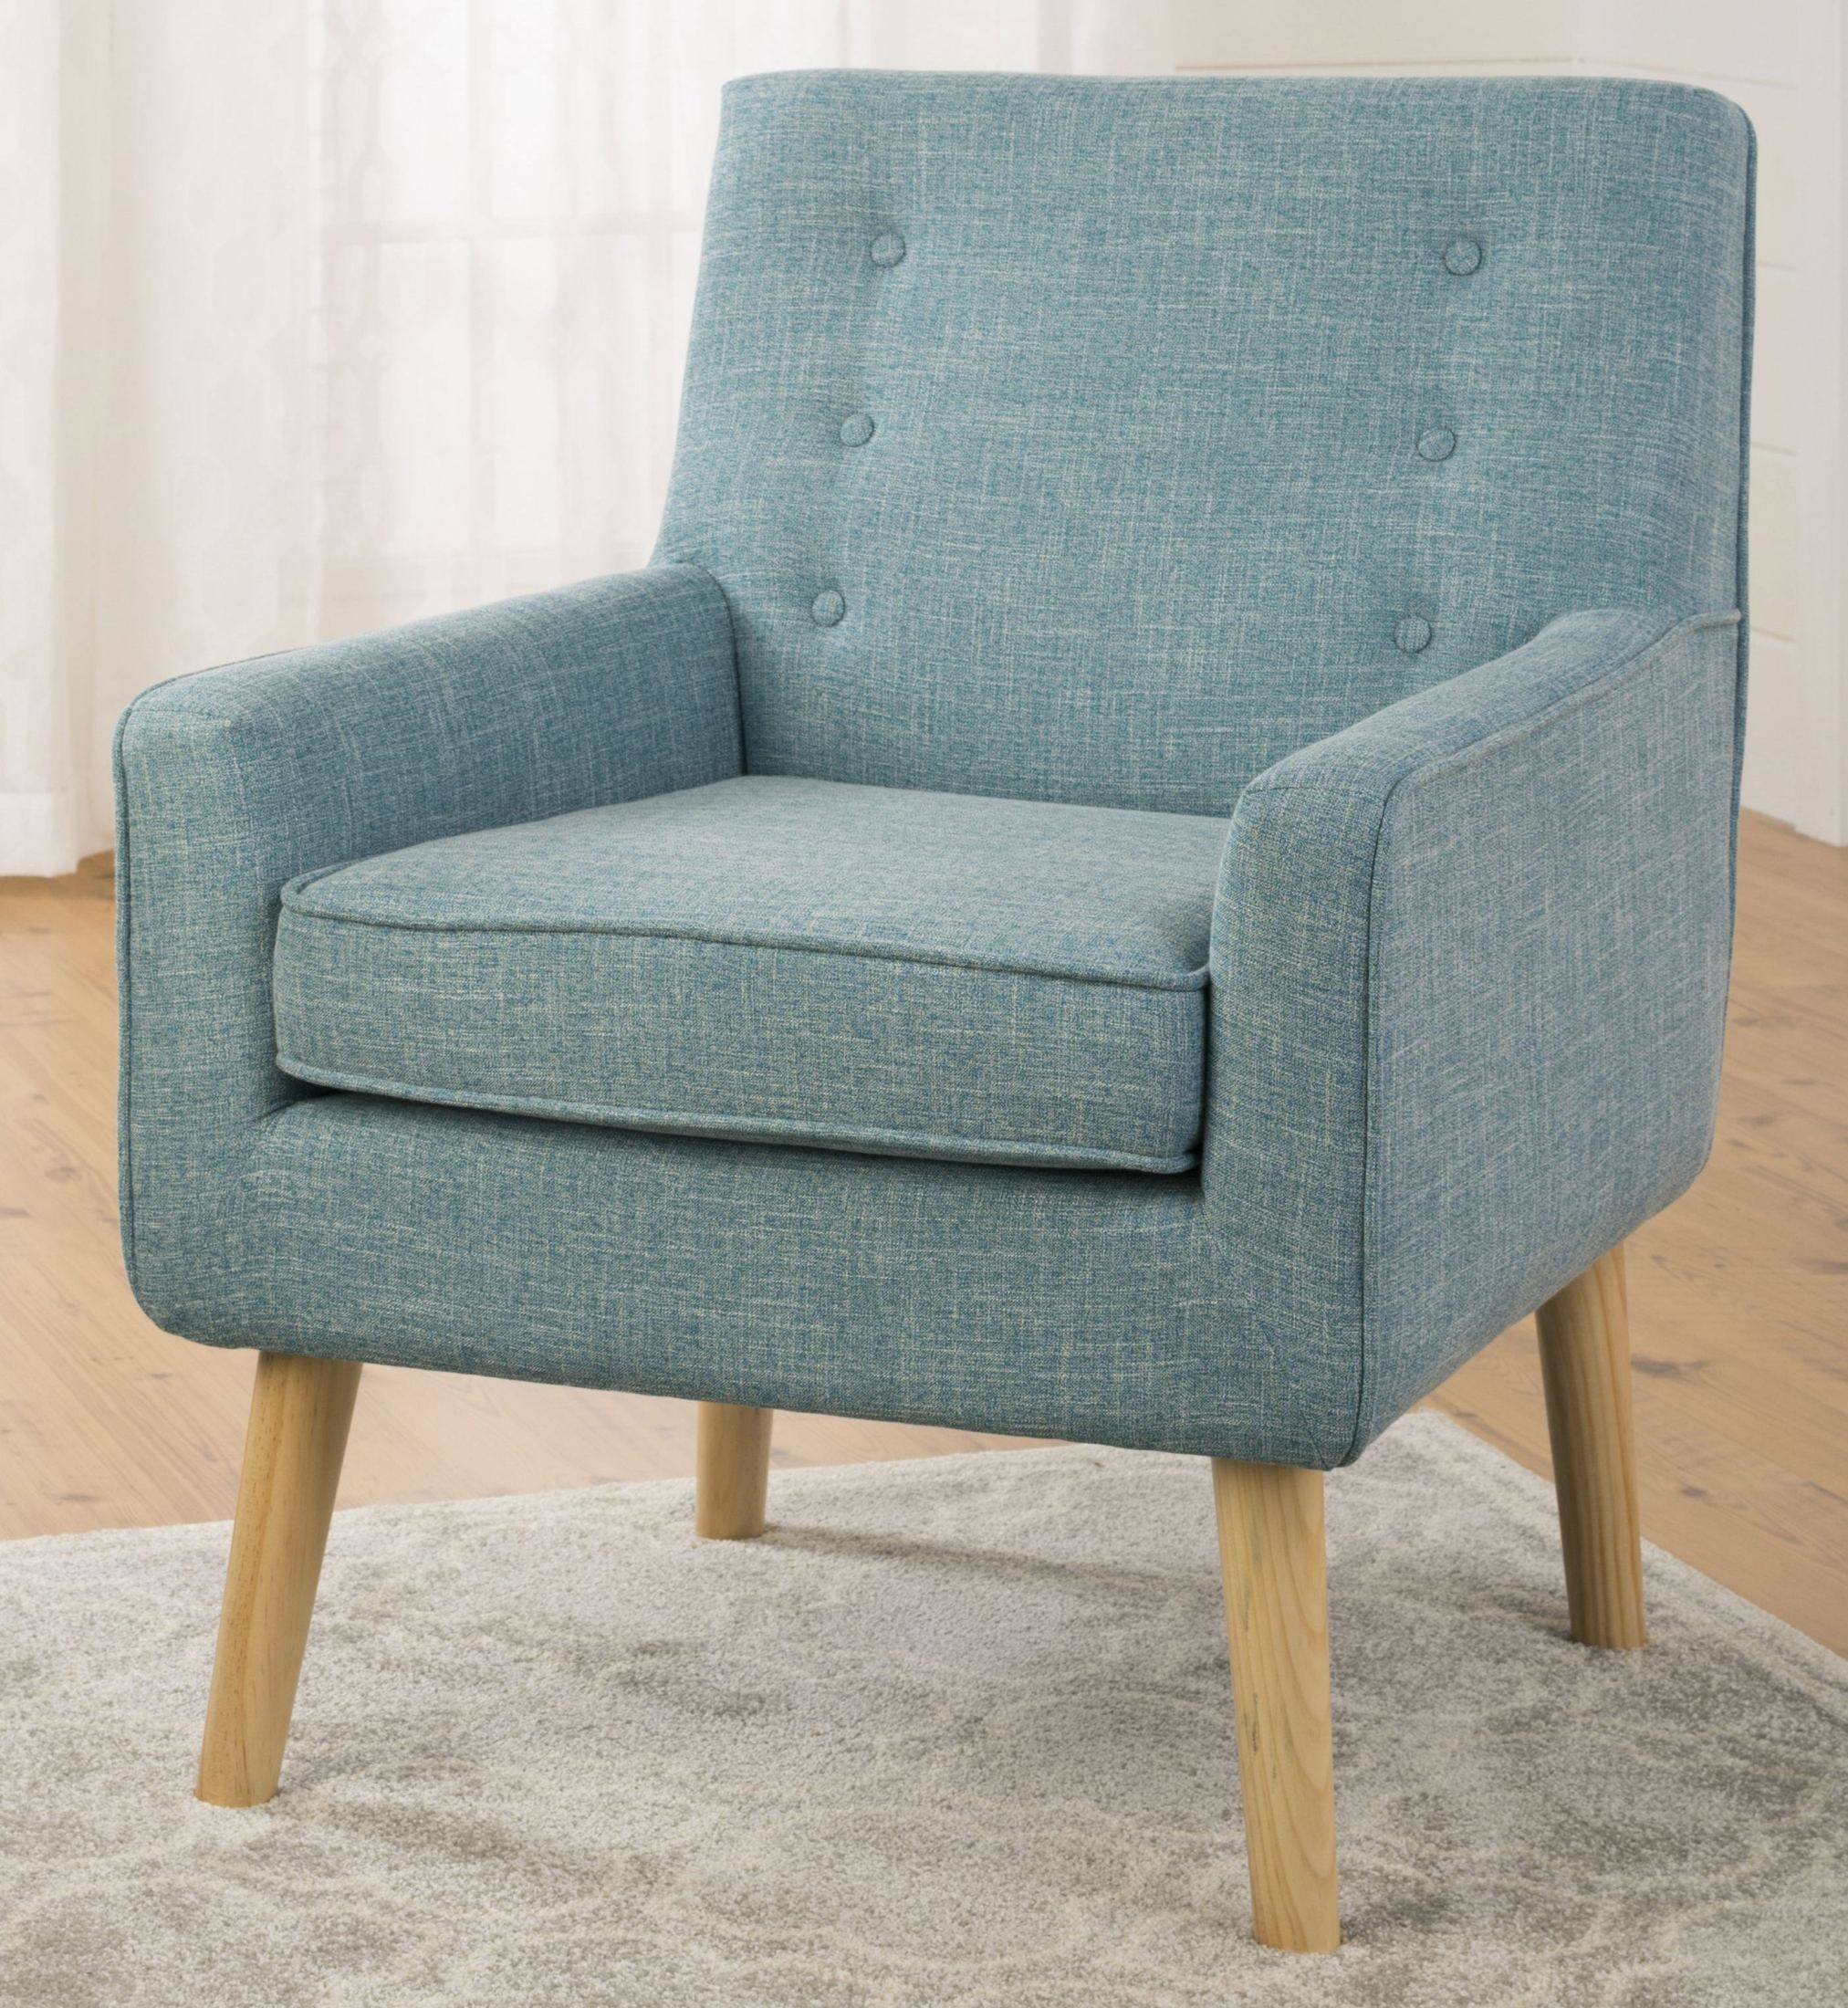 Mila Mod Peacock Blue Accent Chair MILA CH PEACOCK Jofran